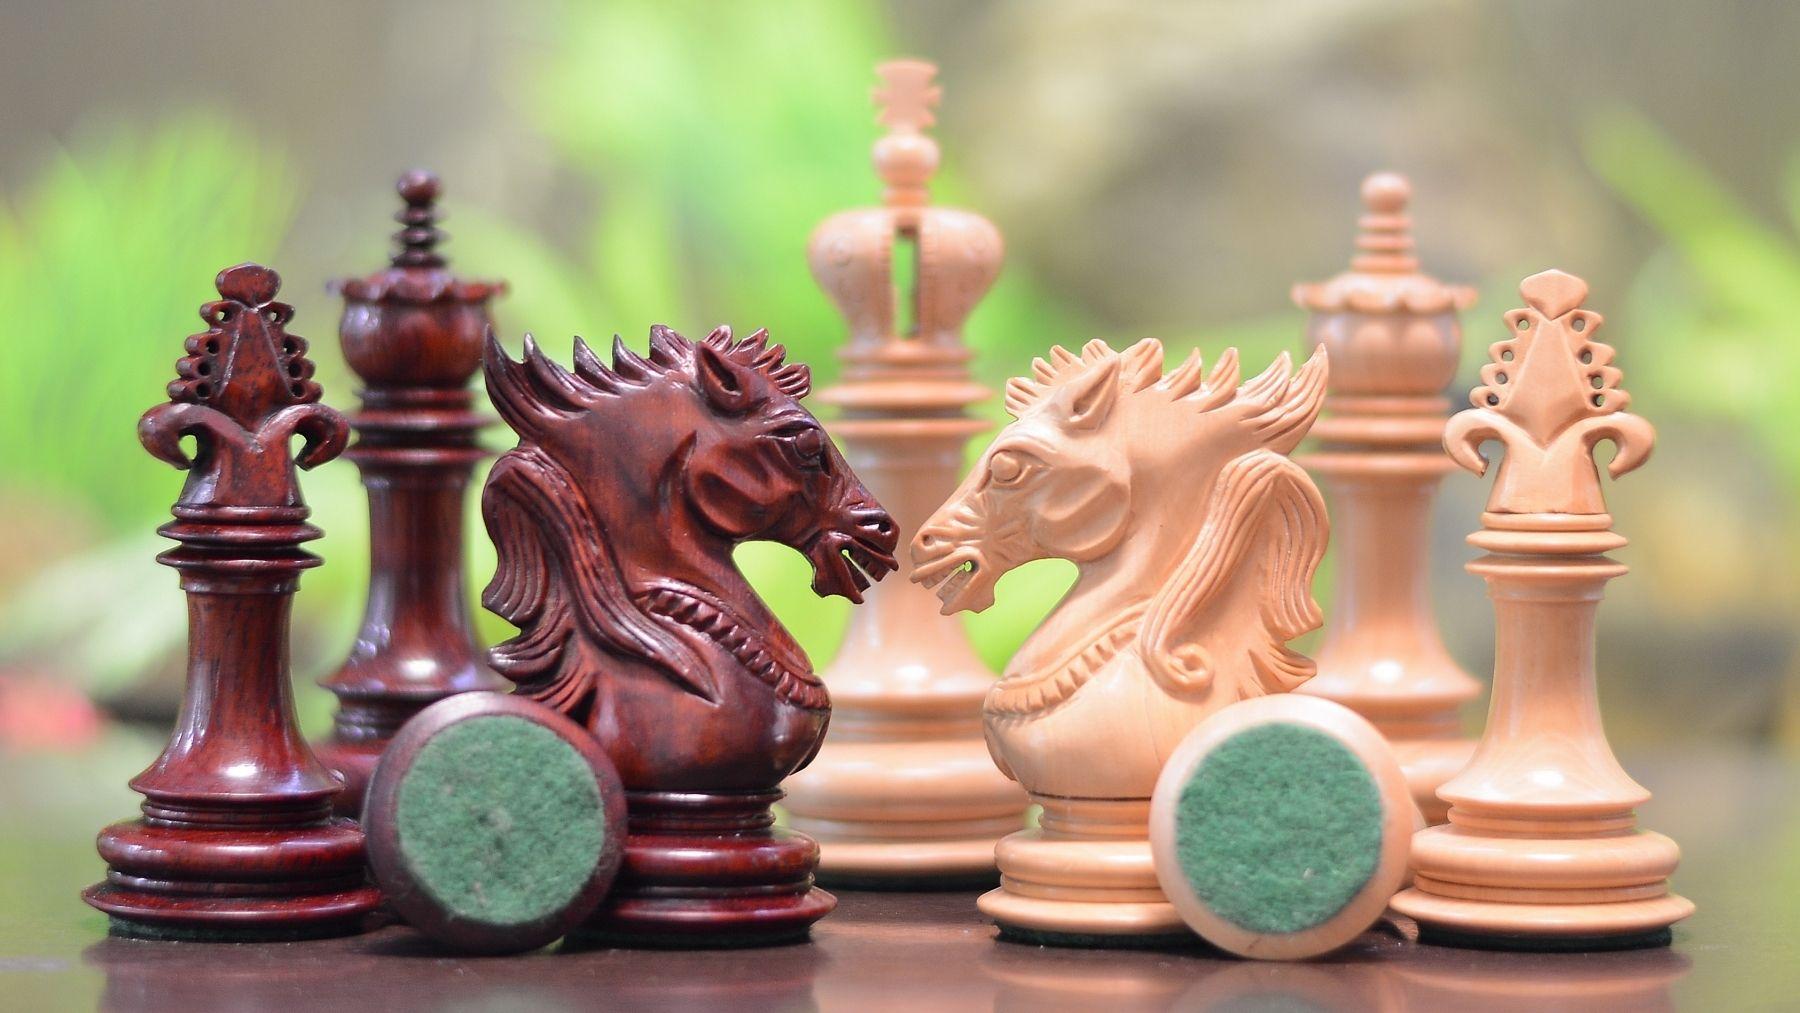 Dragon Knight Chess Pieces In Bud Rose/Box Wood-4.6, लकड़ी के शतरंज सेट,  वुडन चैस सेट - Art Smart, Mohali | ID: 9828737130